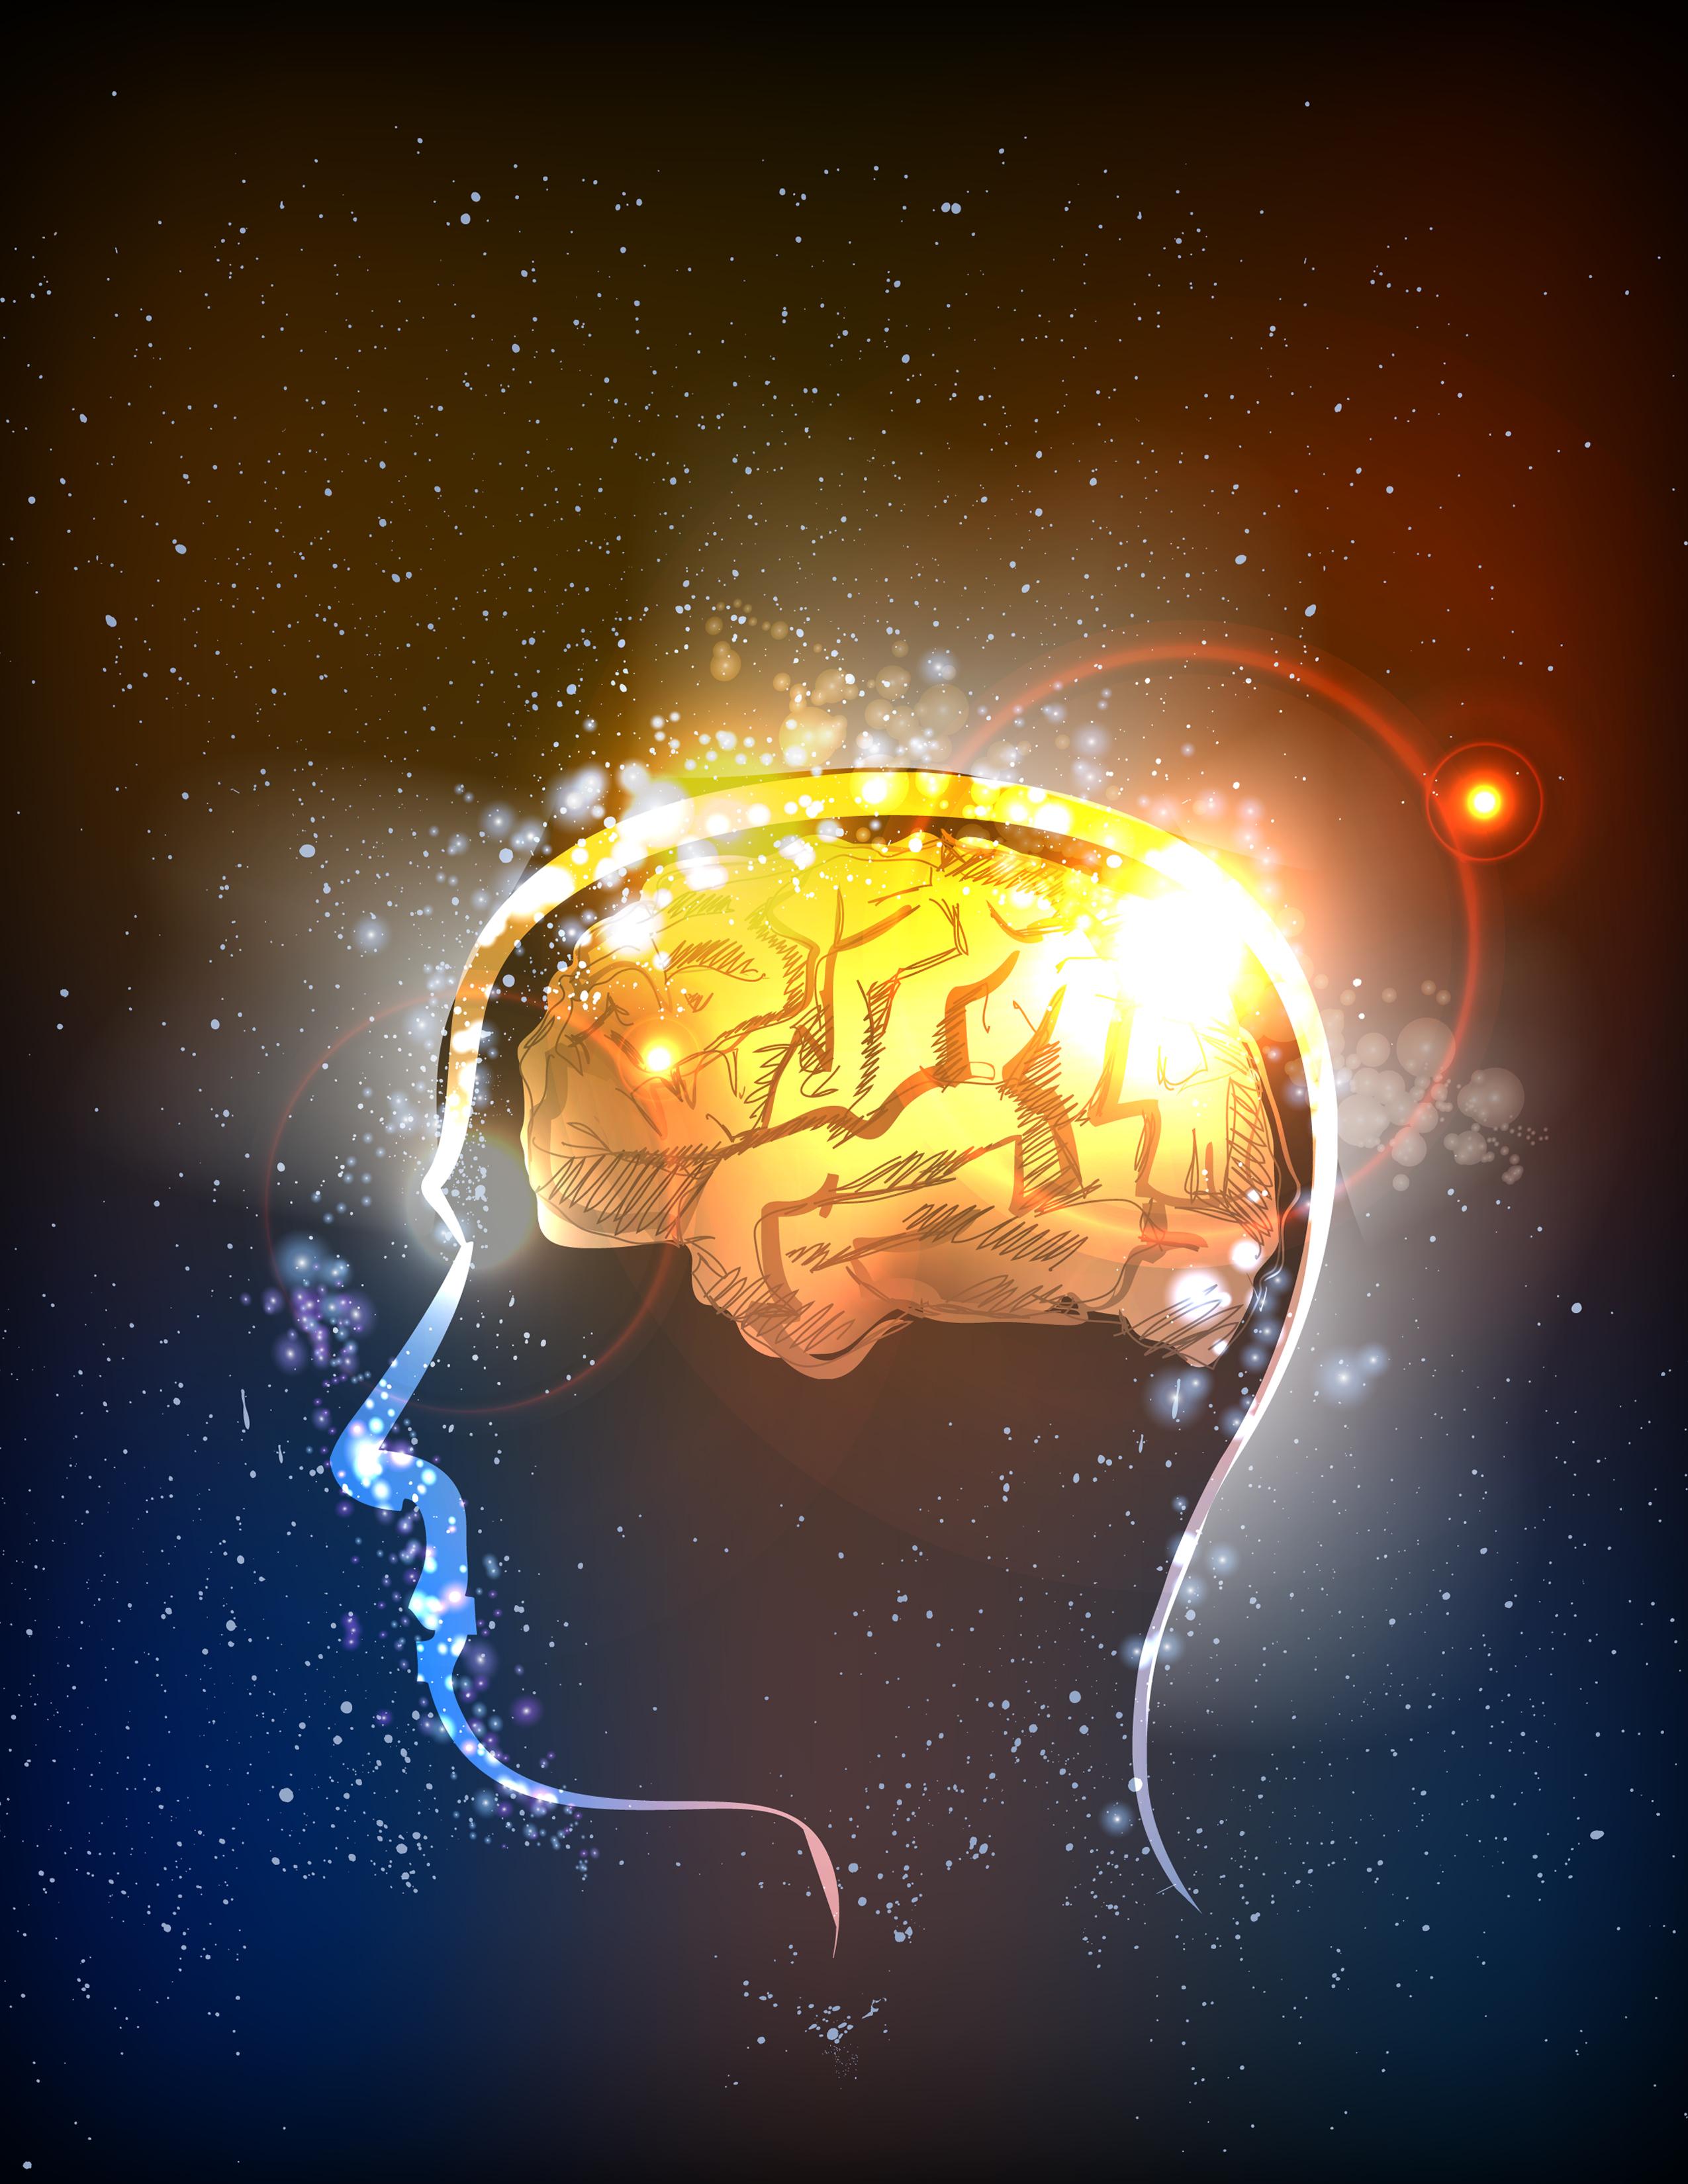 Foods that increase memory recall